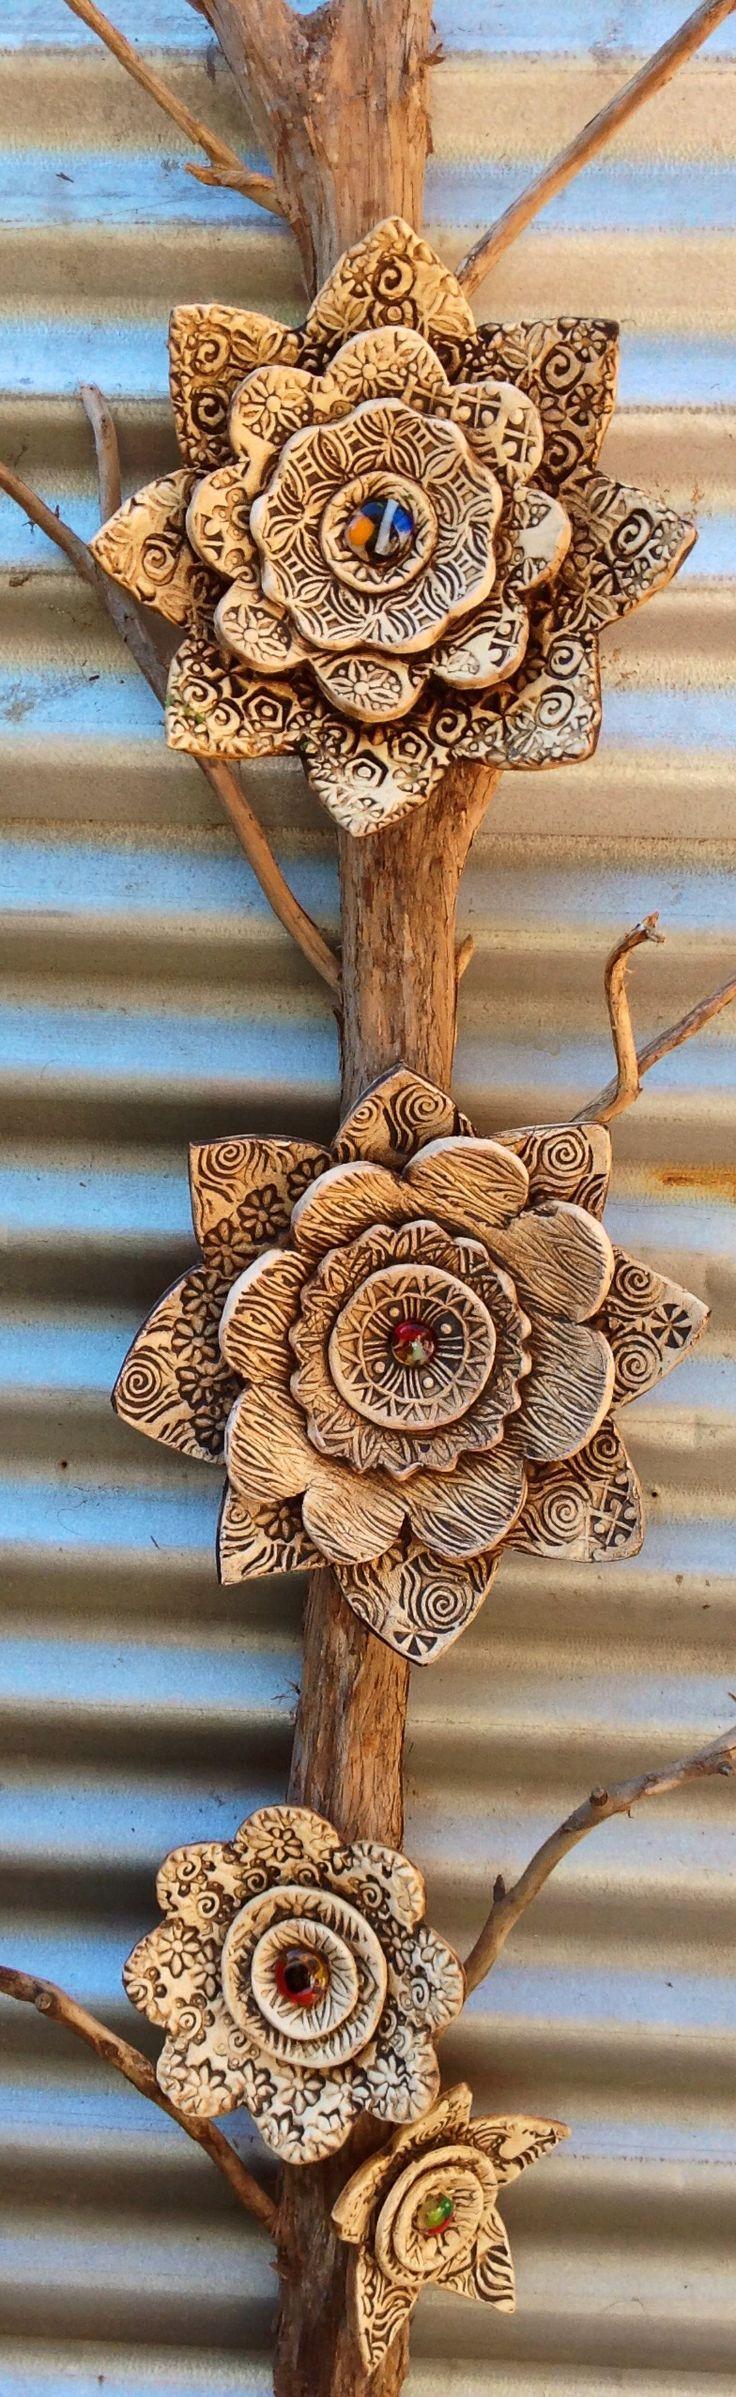 Handmade ceramic flowers.